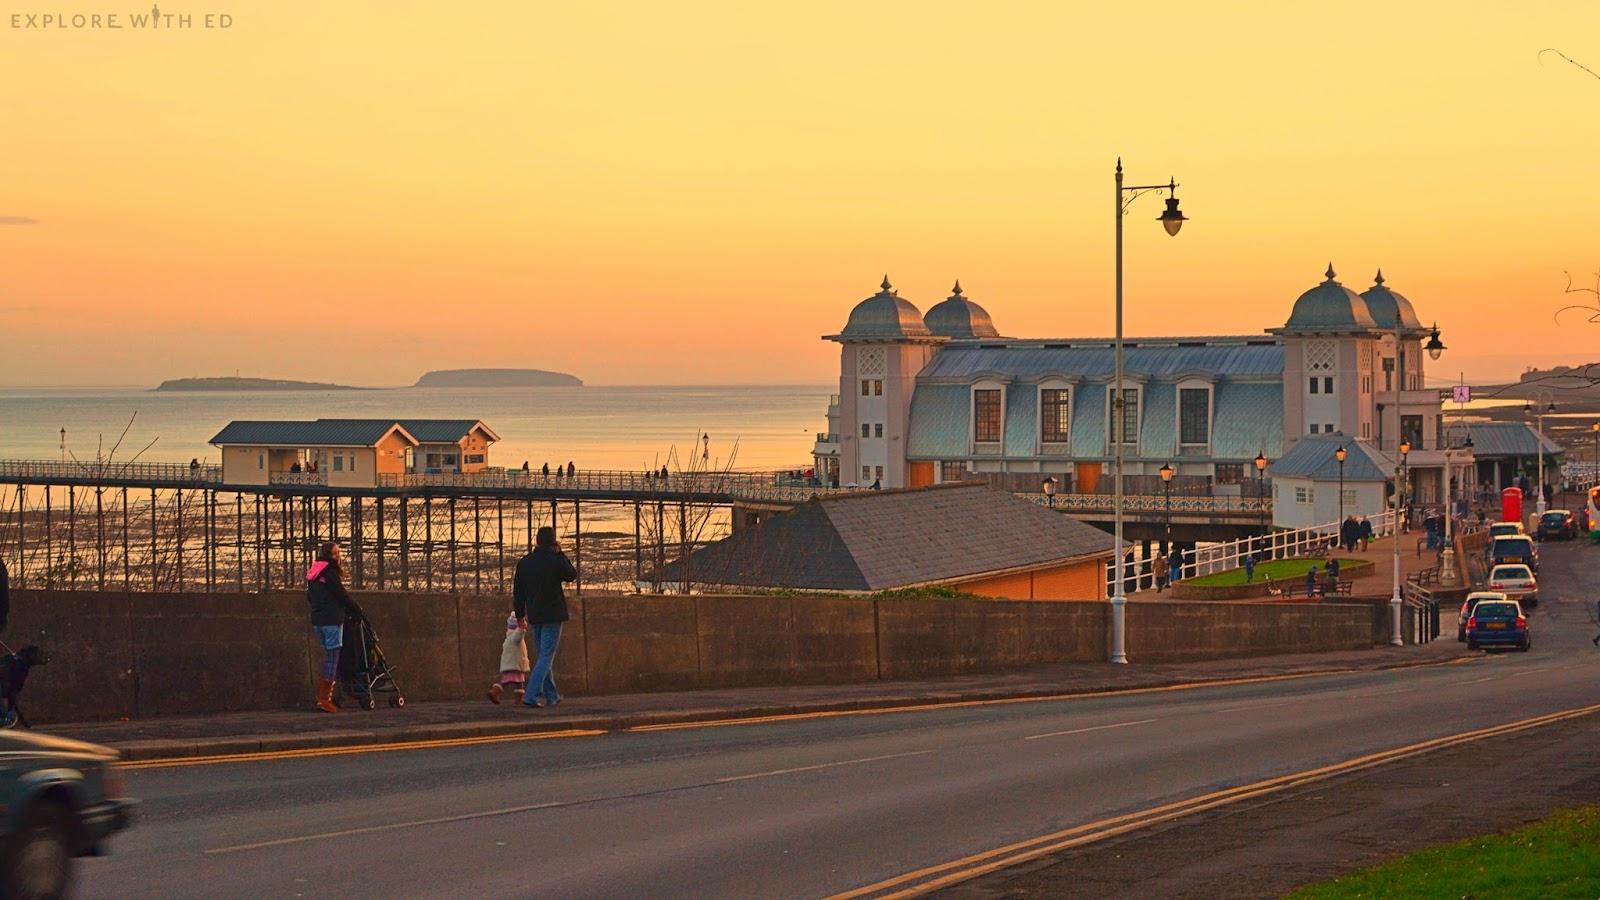 Golden sky and Penarth Pier